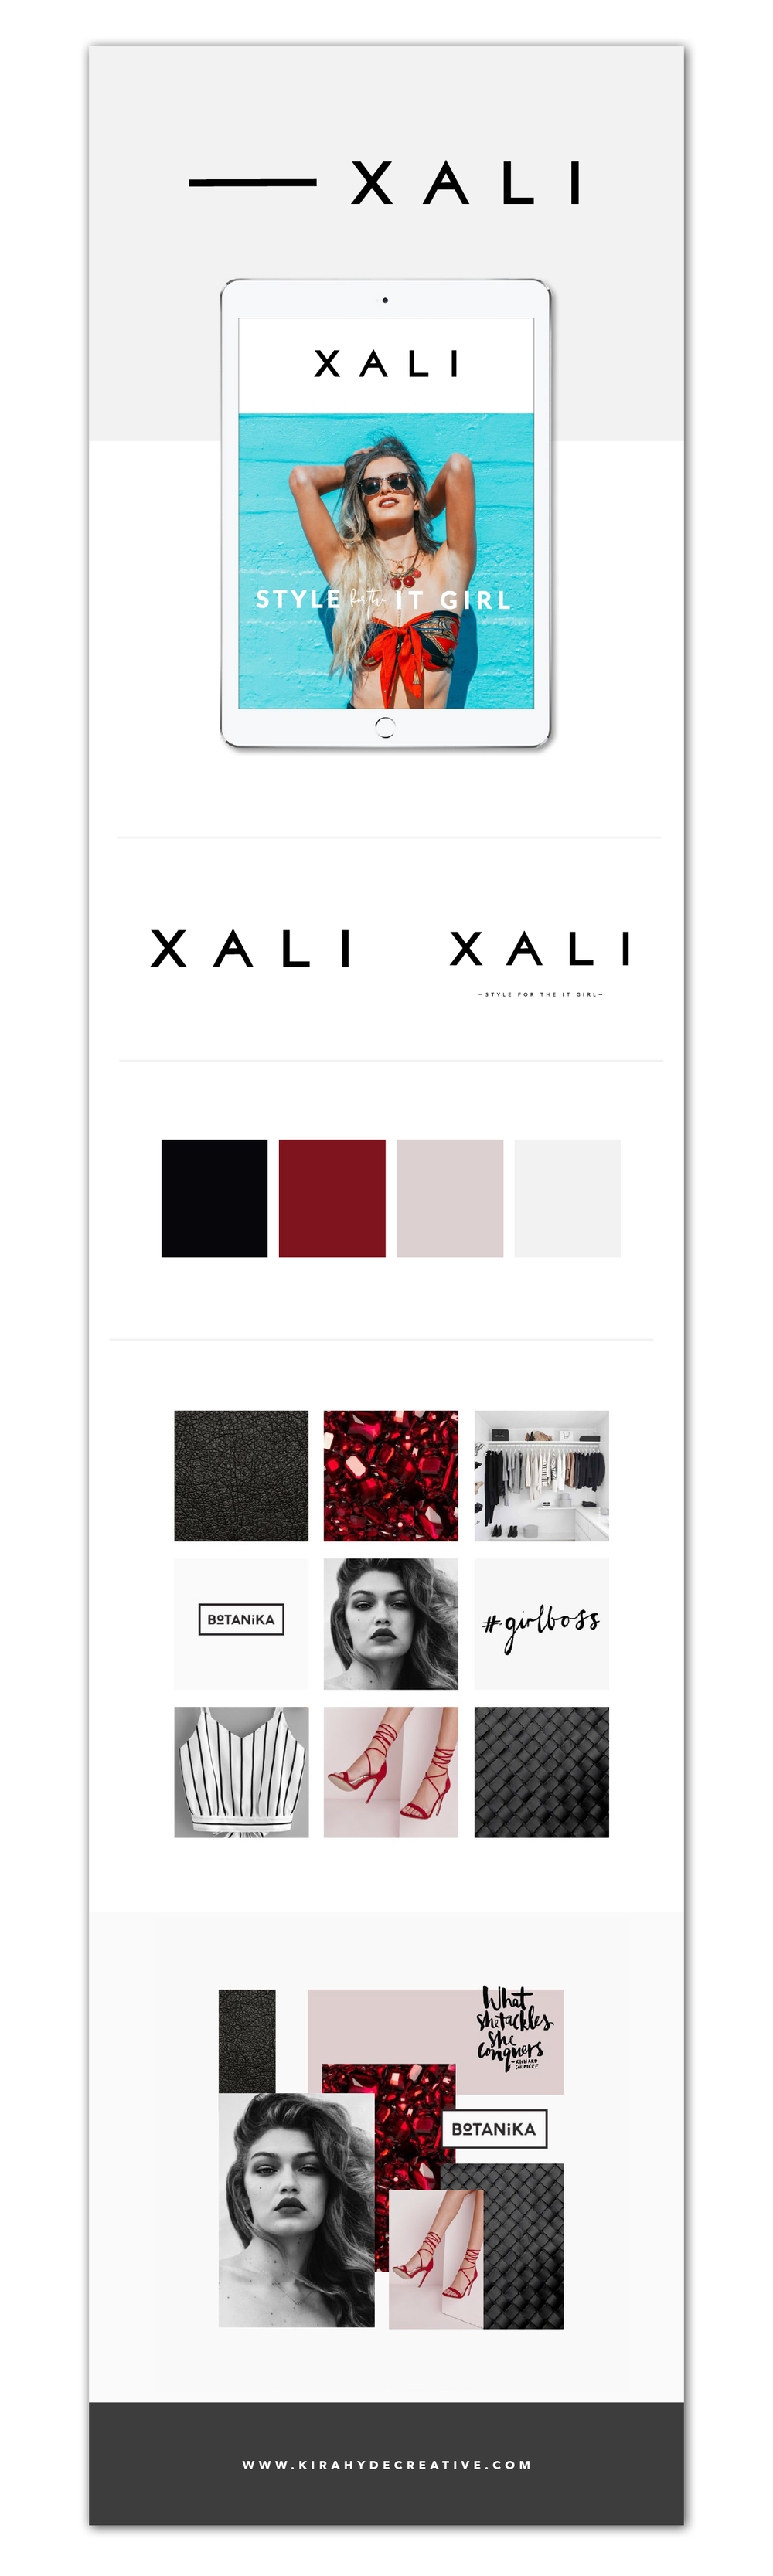 Xali Brand Board - Kira Hyde Creative Portfolio